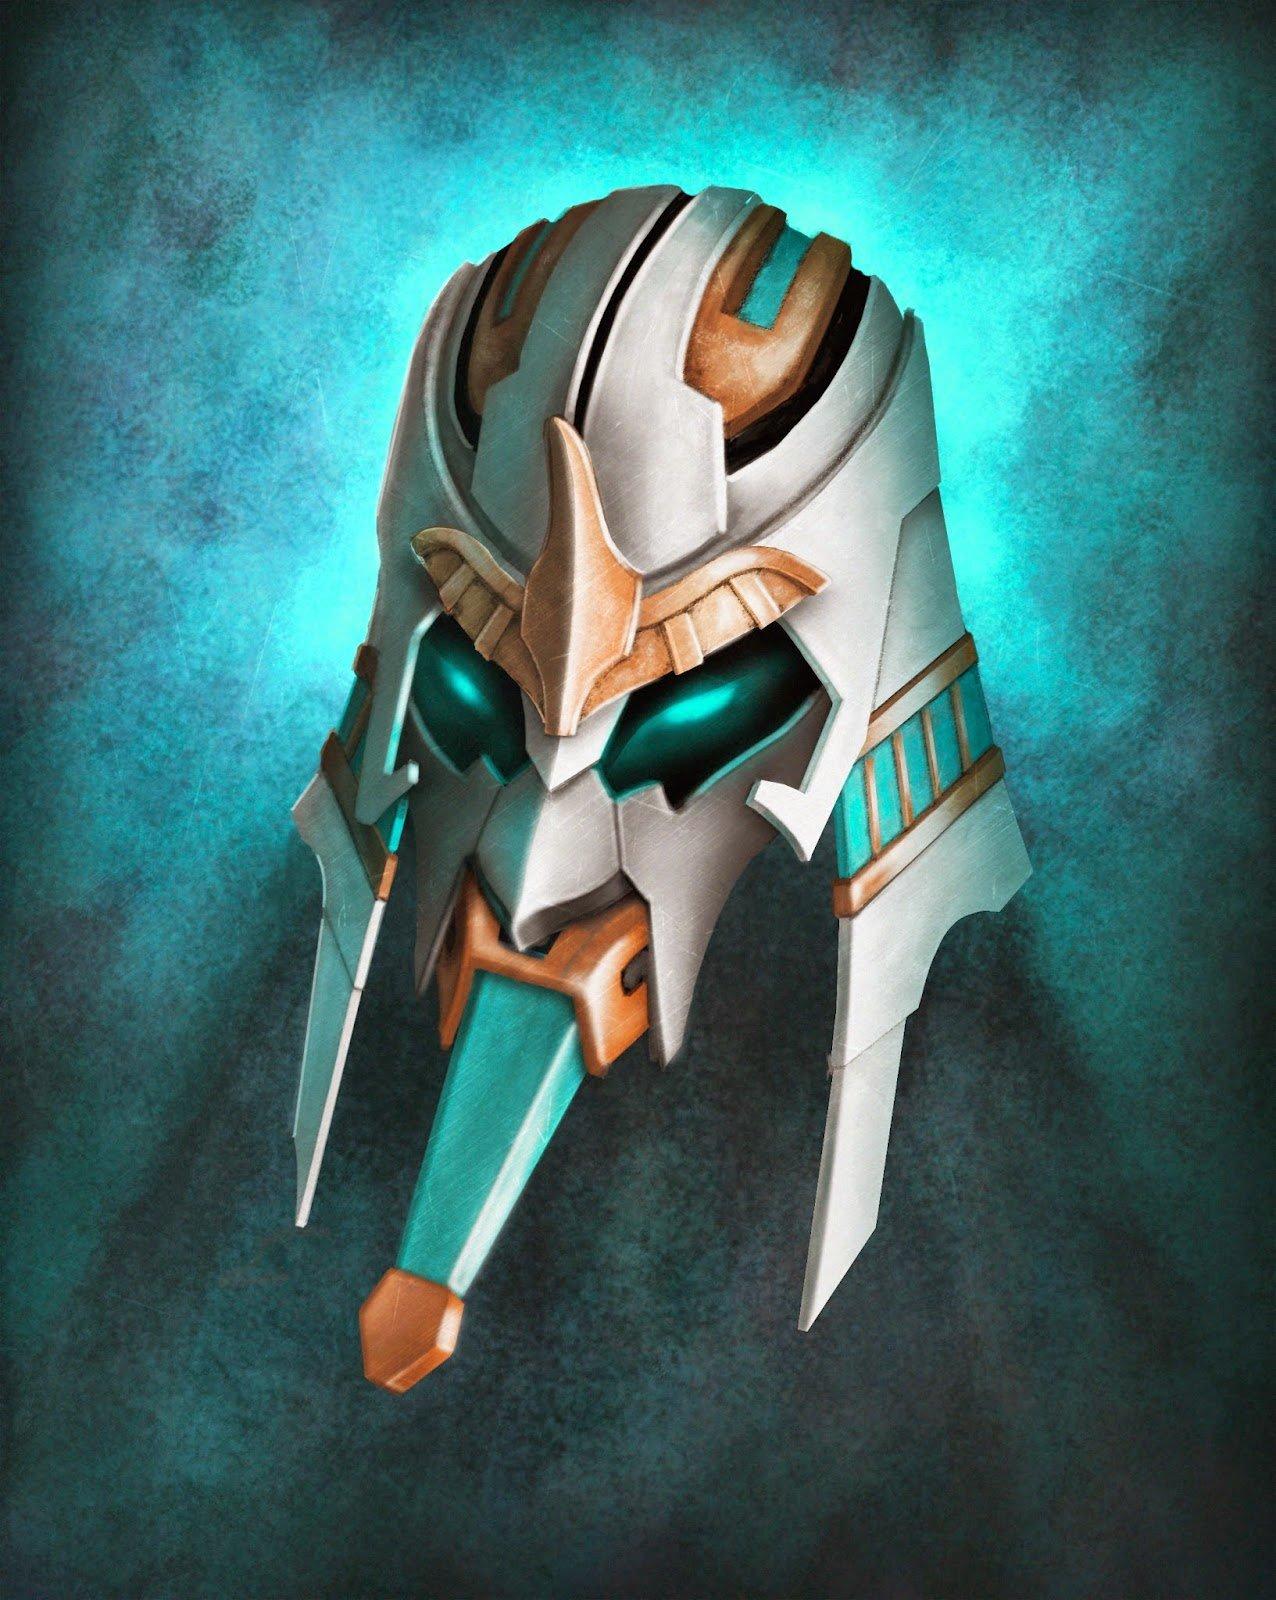 mario-privitera-egypt-helmet-shi-fi.jpg?